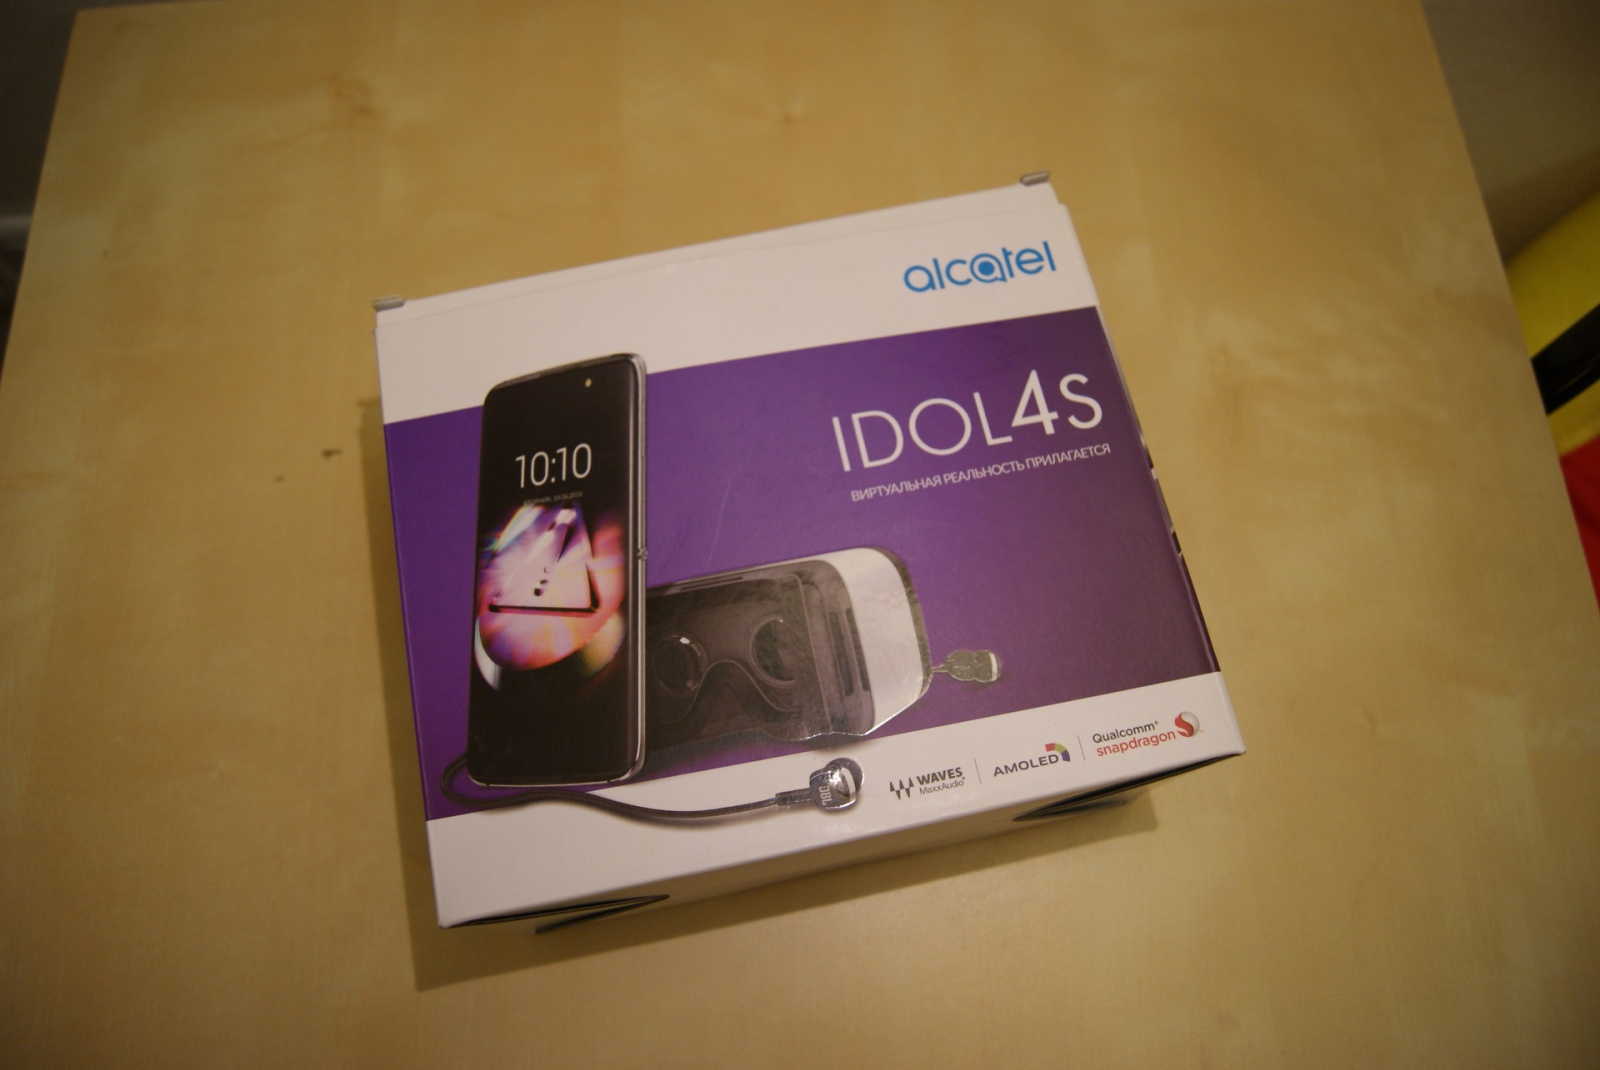 Обзор Alcatel IDOL 4S: виртуальная реальность из коробки - 2